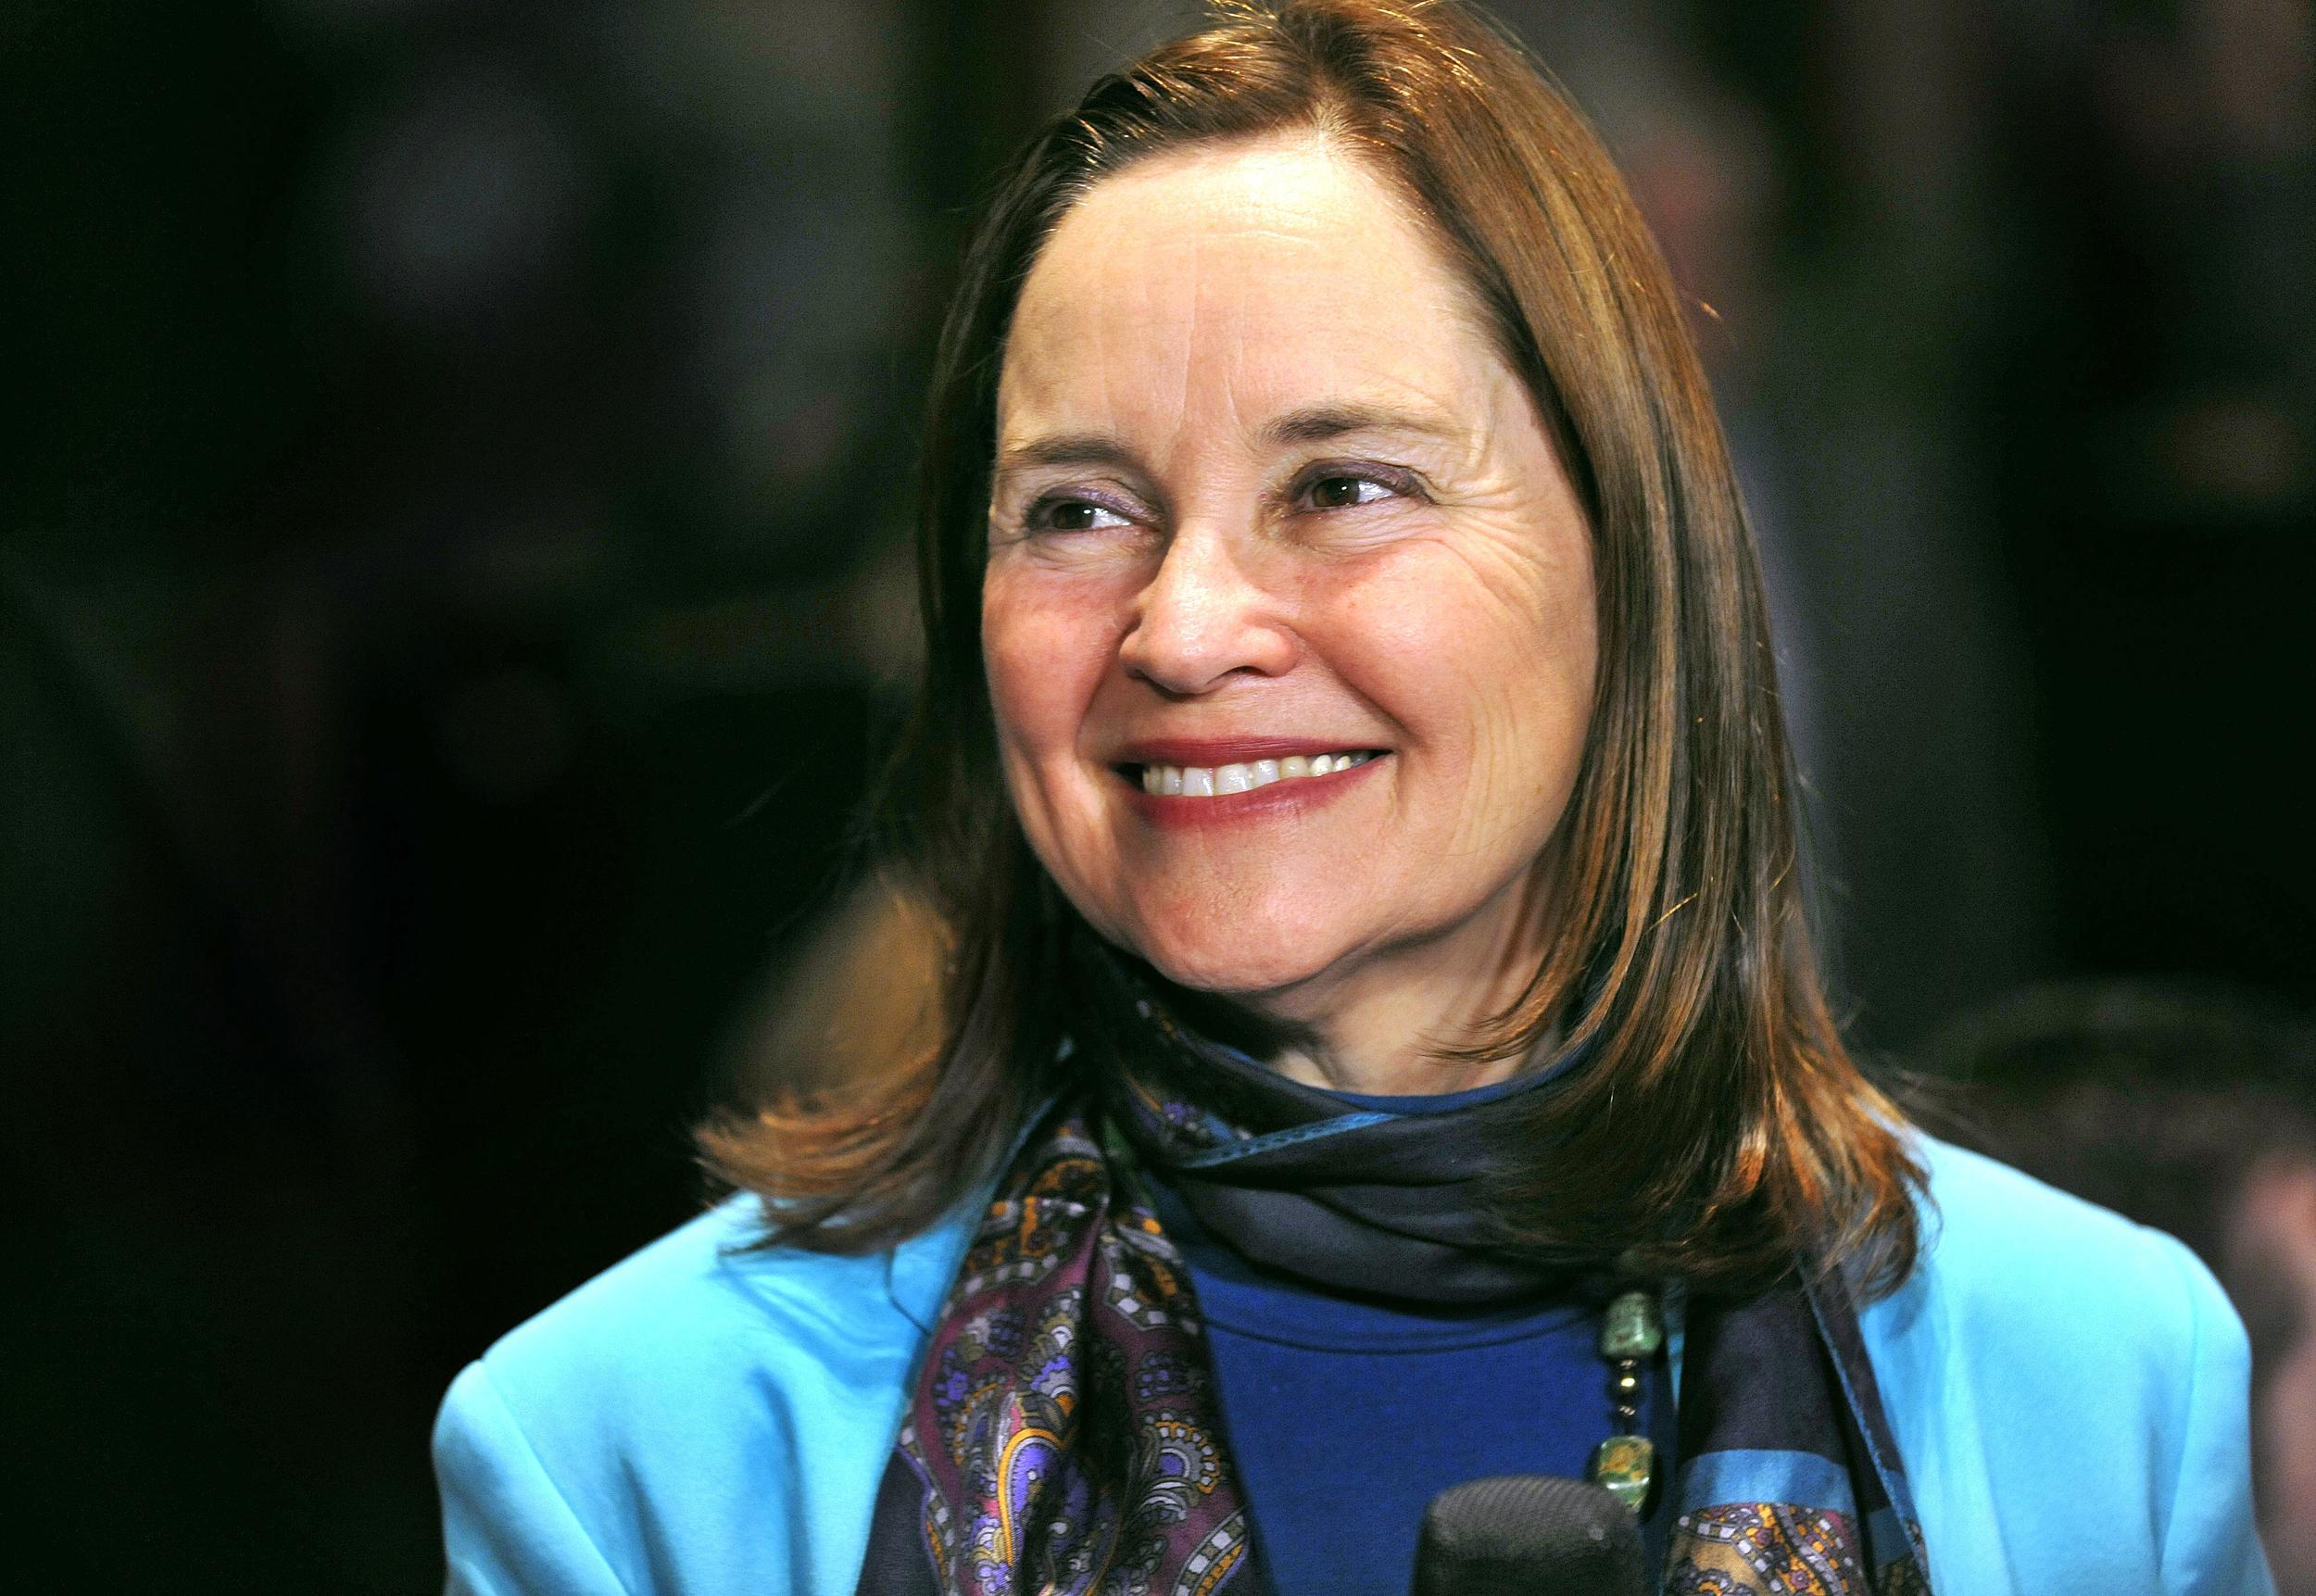 Image: Connecticut secretary of state Denise Merrill